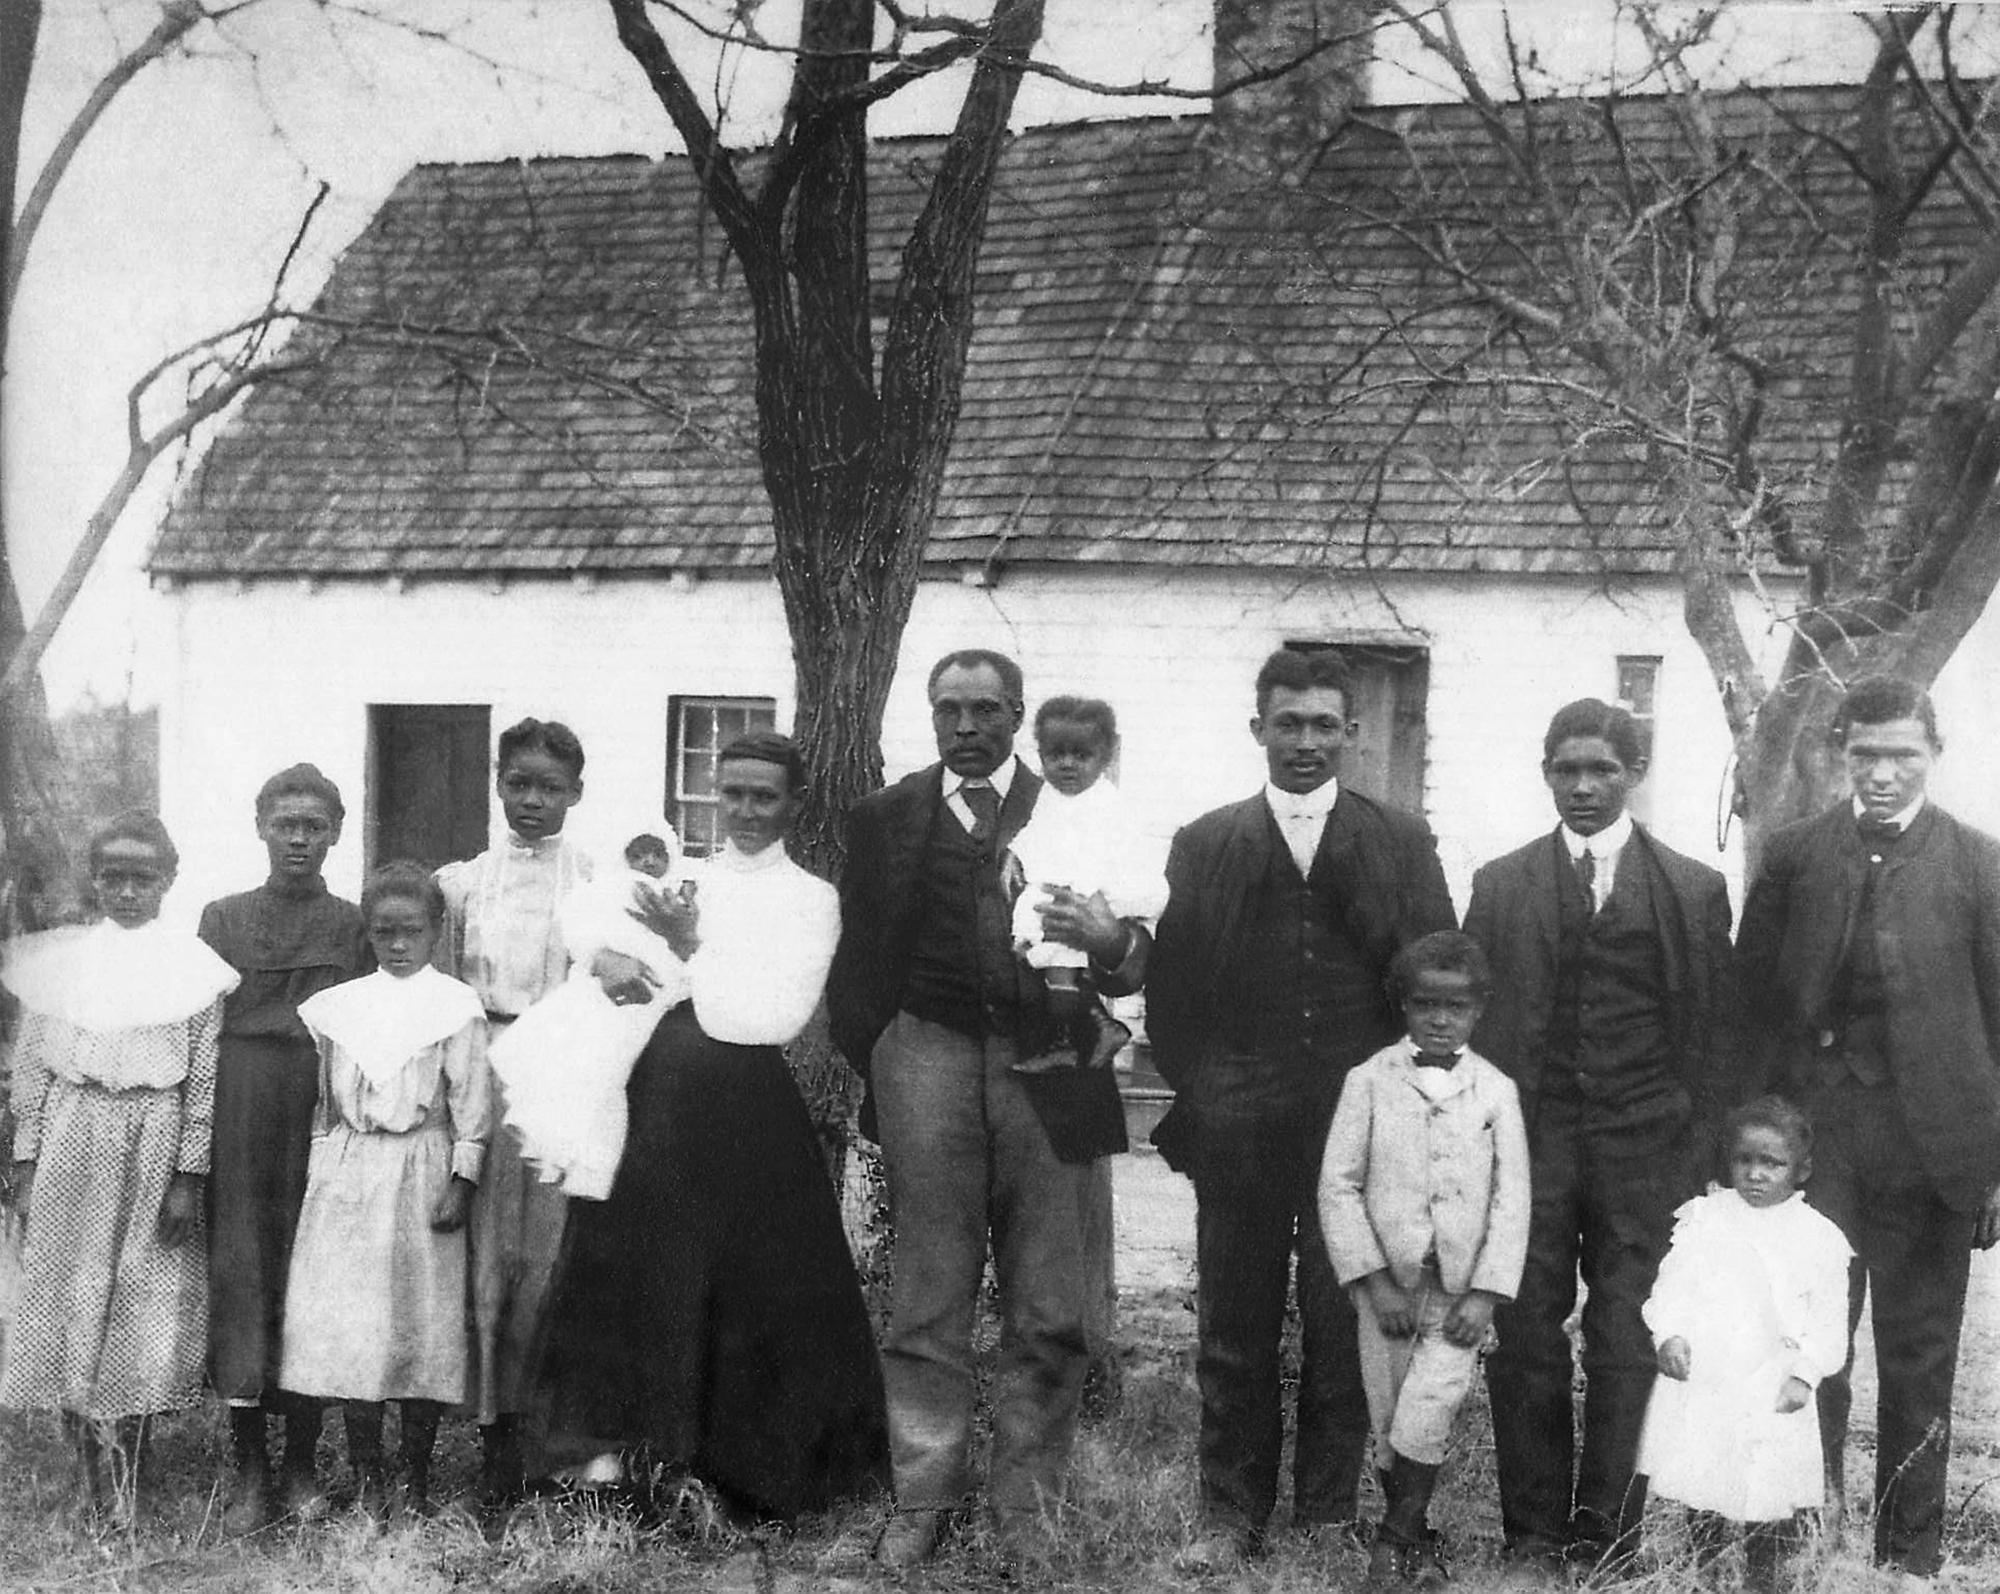 Restored family portrait, c. 1900